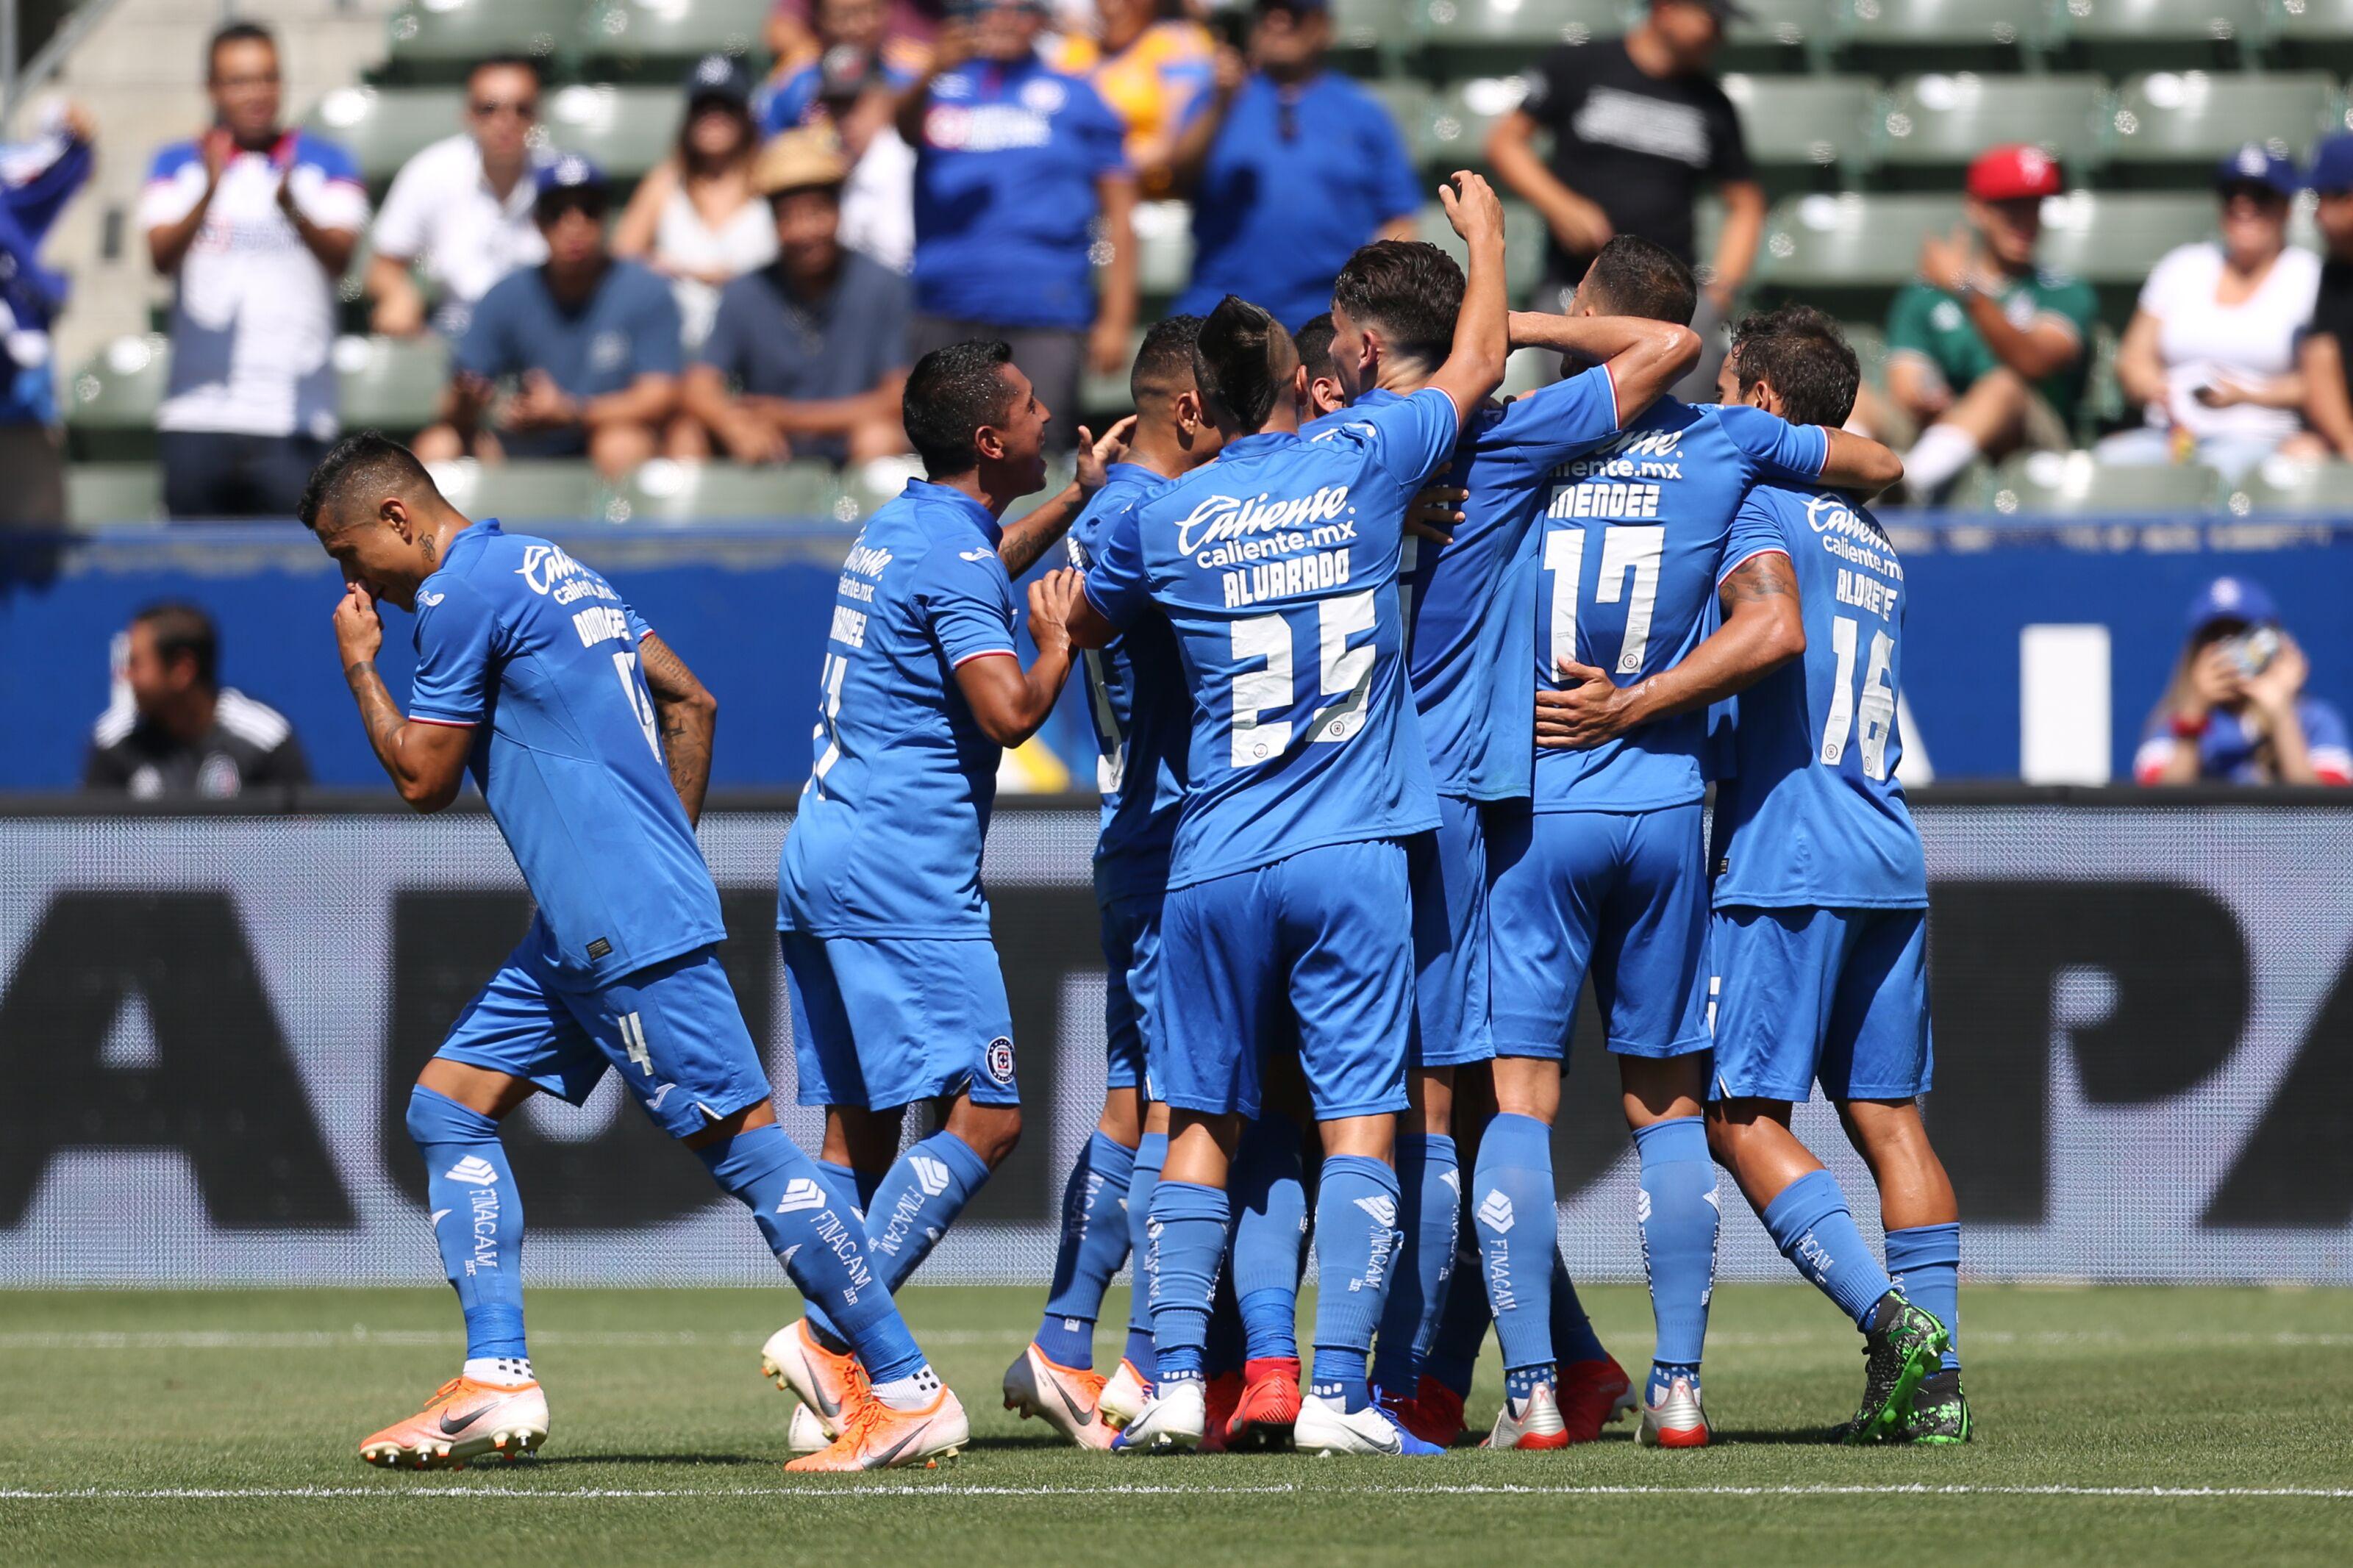 Cruz Azul claims first trophy of season in SuperCopa finale